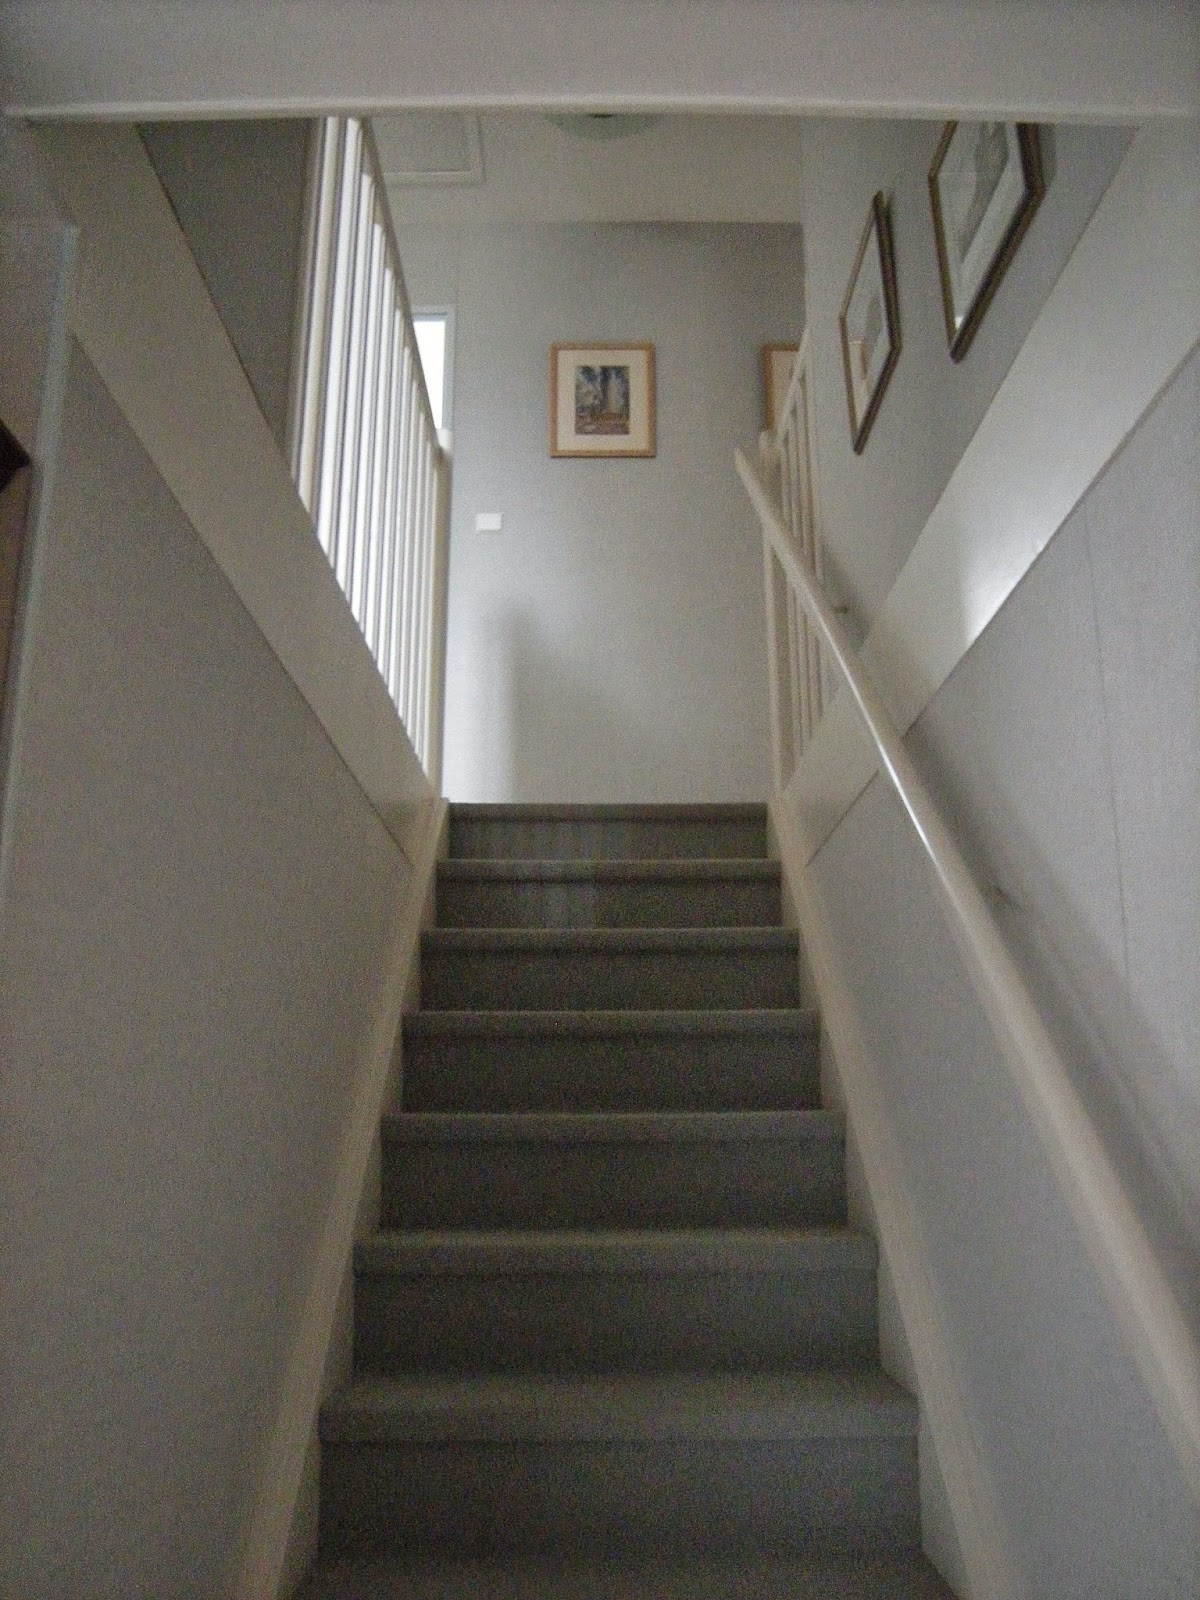 decoration d entree avec escalier. Black Bedroom Furniture Sets. Home Design Ideas